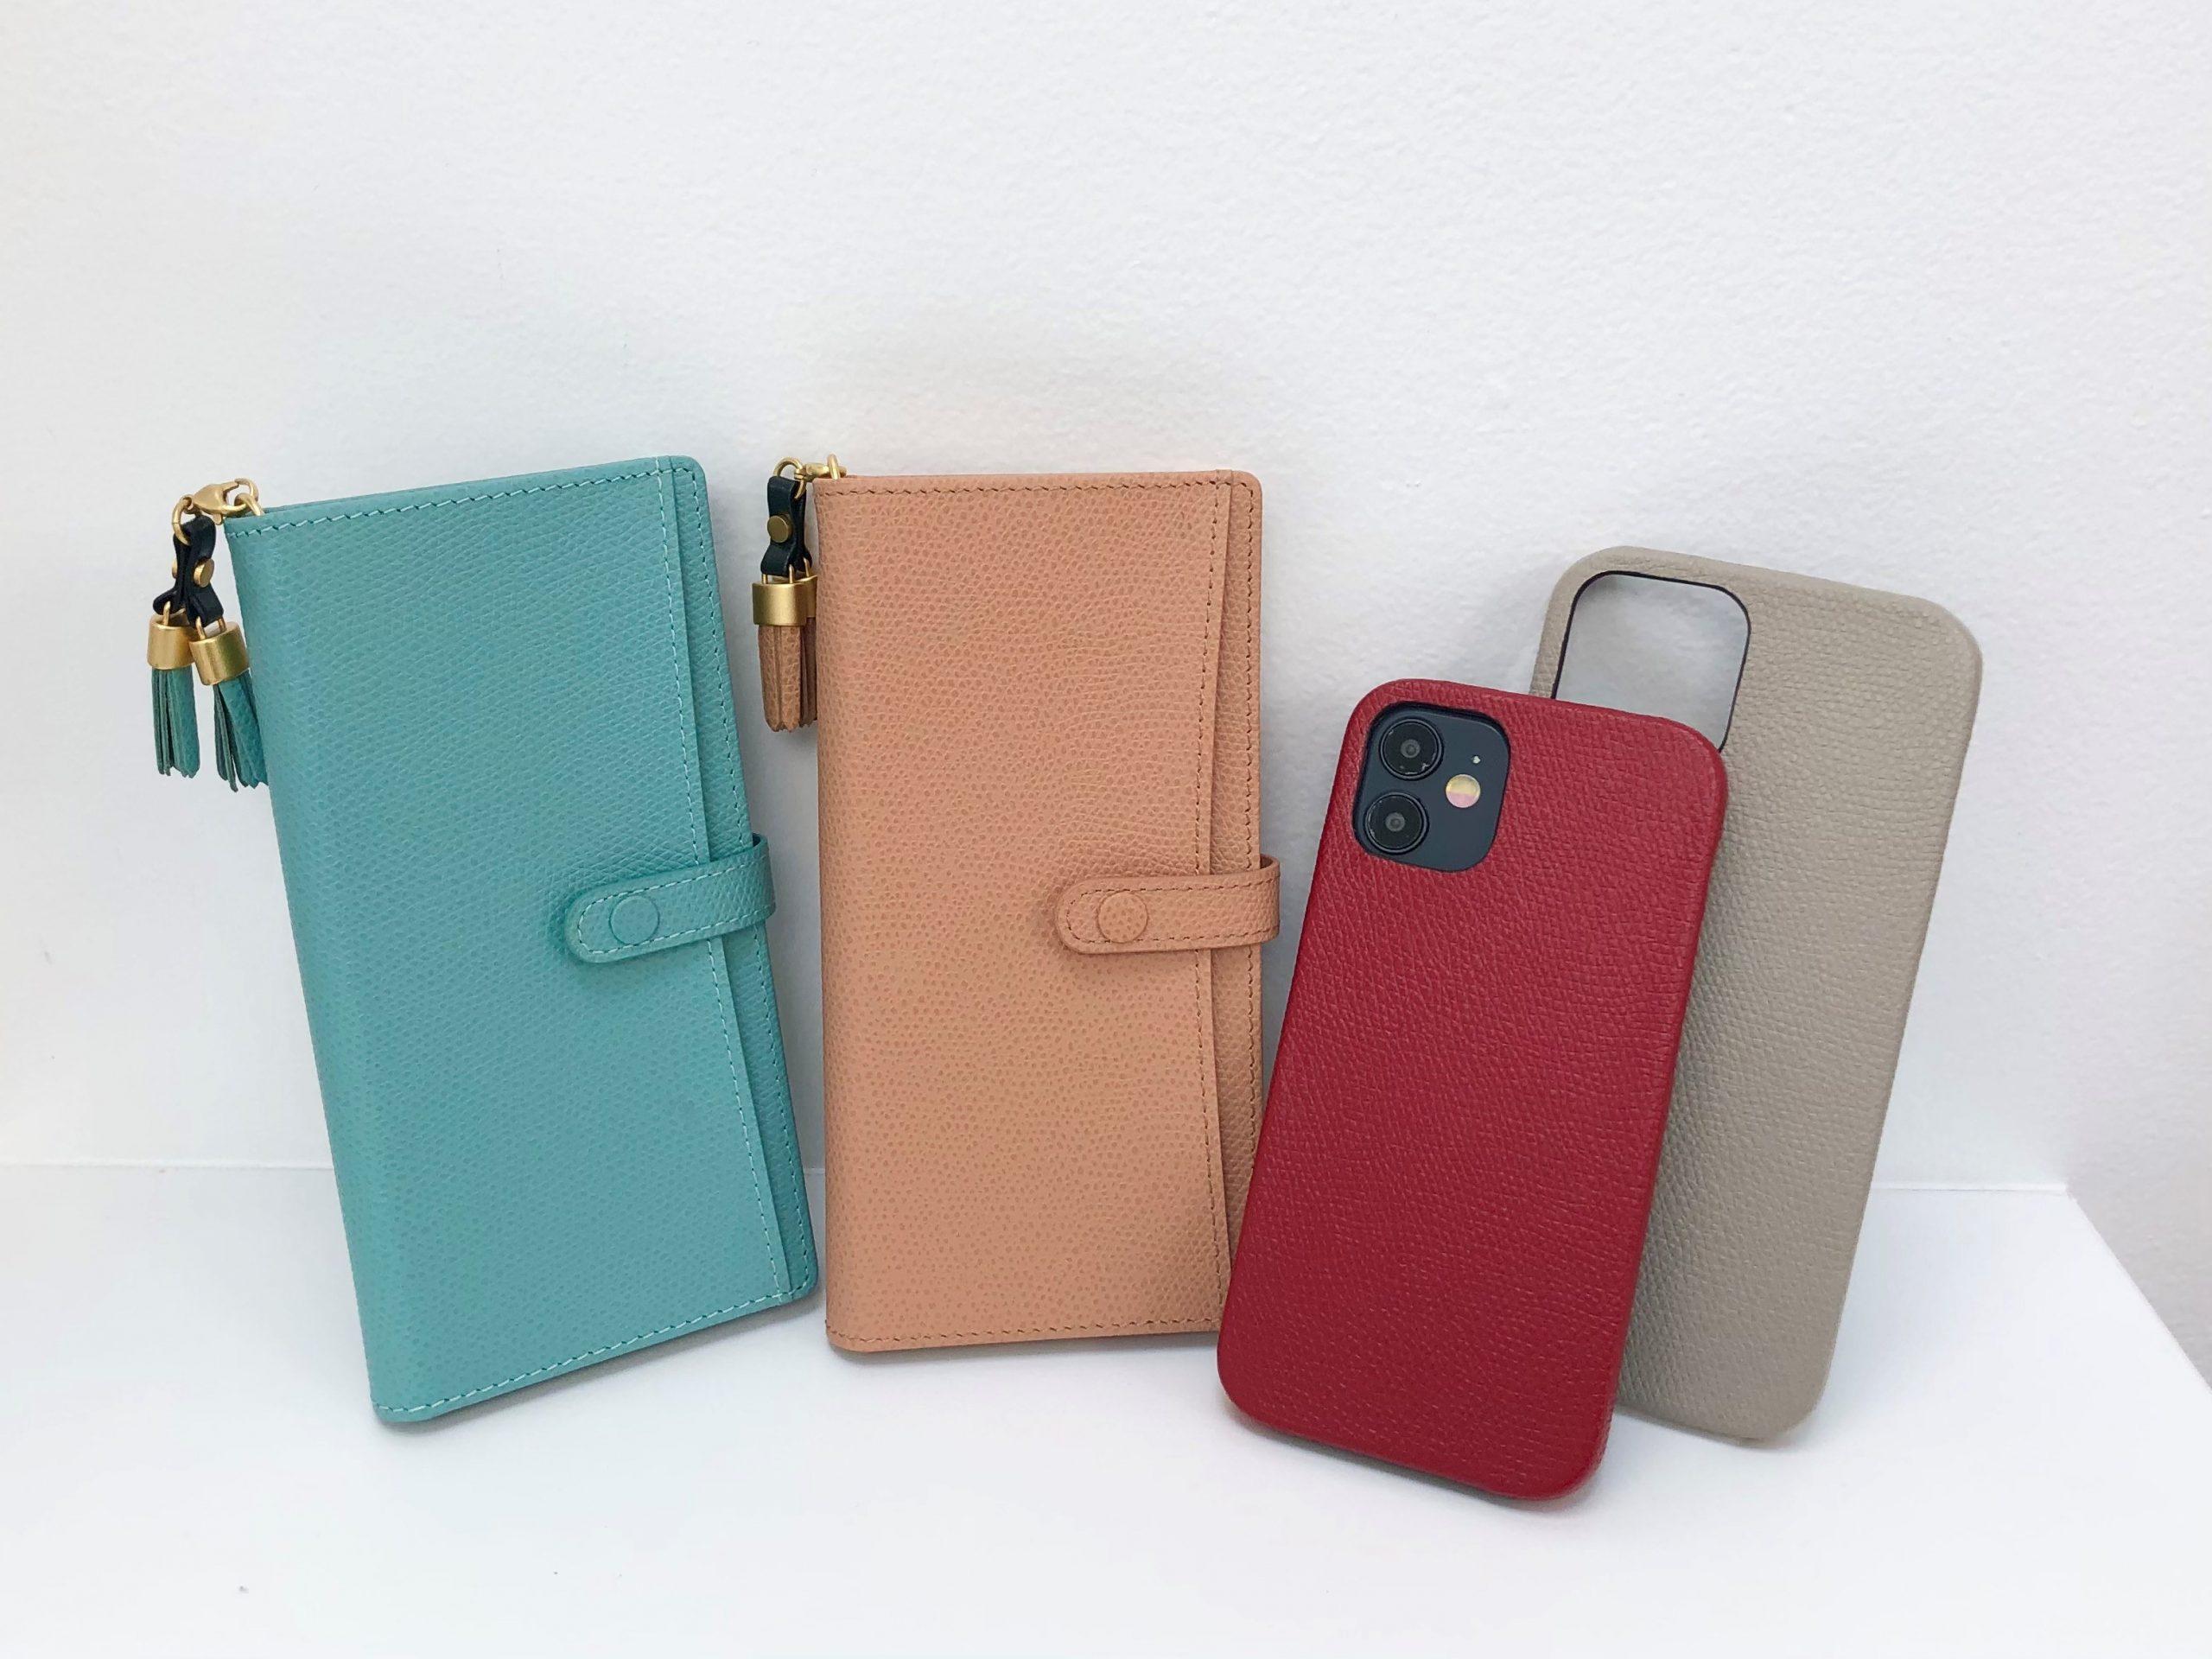 【Epoi本店限定】iPhone12 / 12miniケースの受注を開始しました!